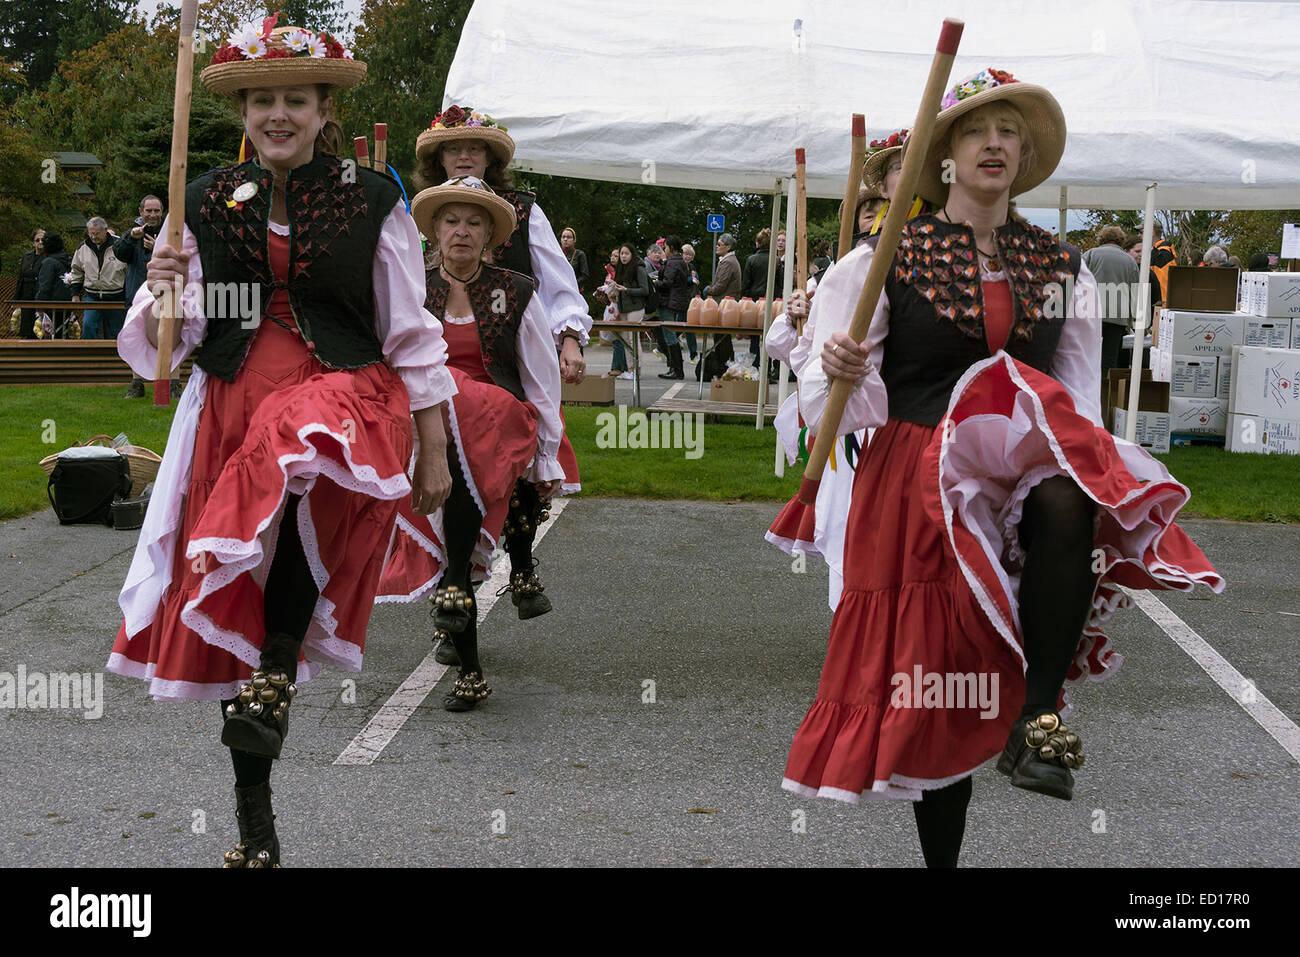 Morris dancers #10, Vancouver, British Columbia, Canada - Stock Image